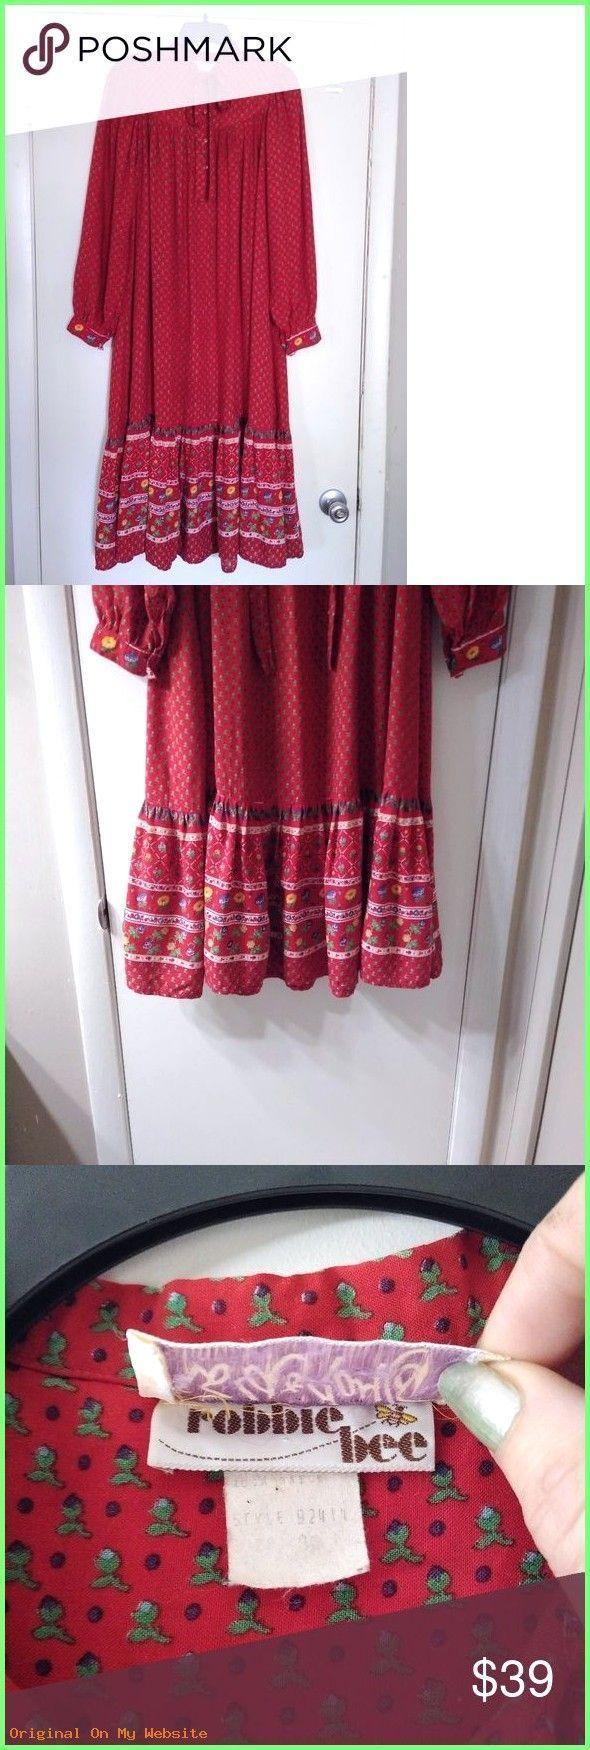 #198039s #Bee #dress #Esprit #Floral #Robbie